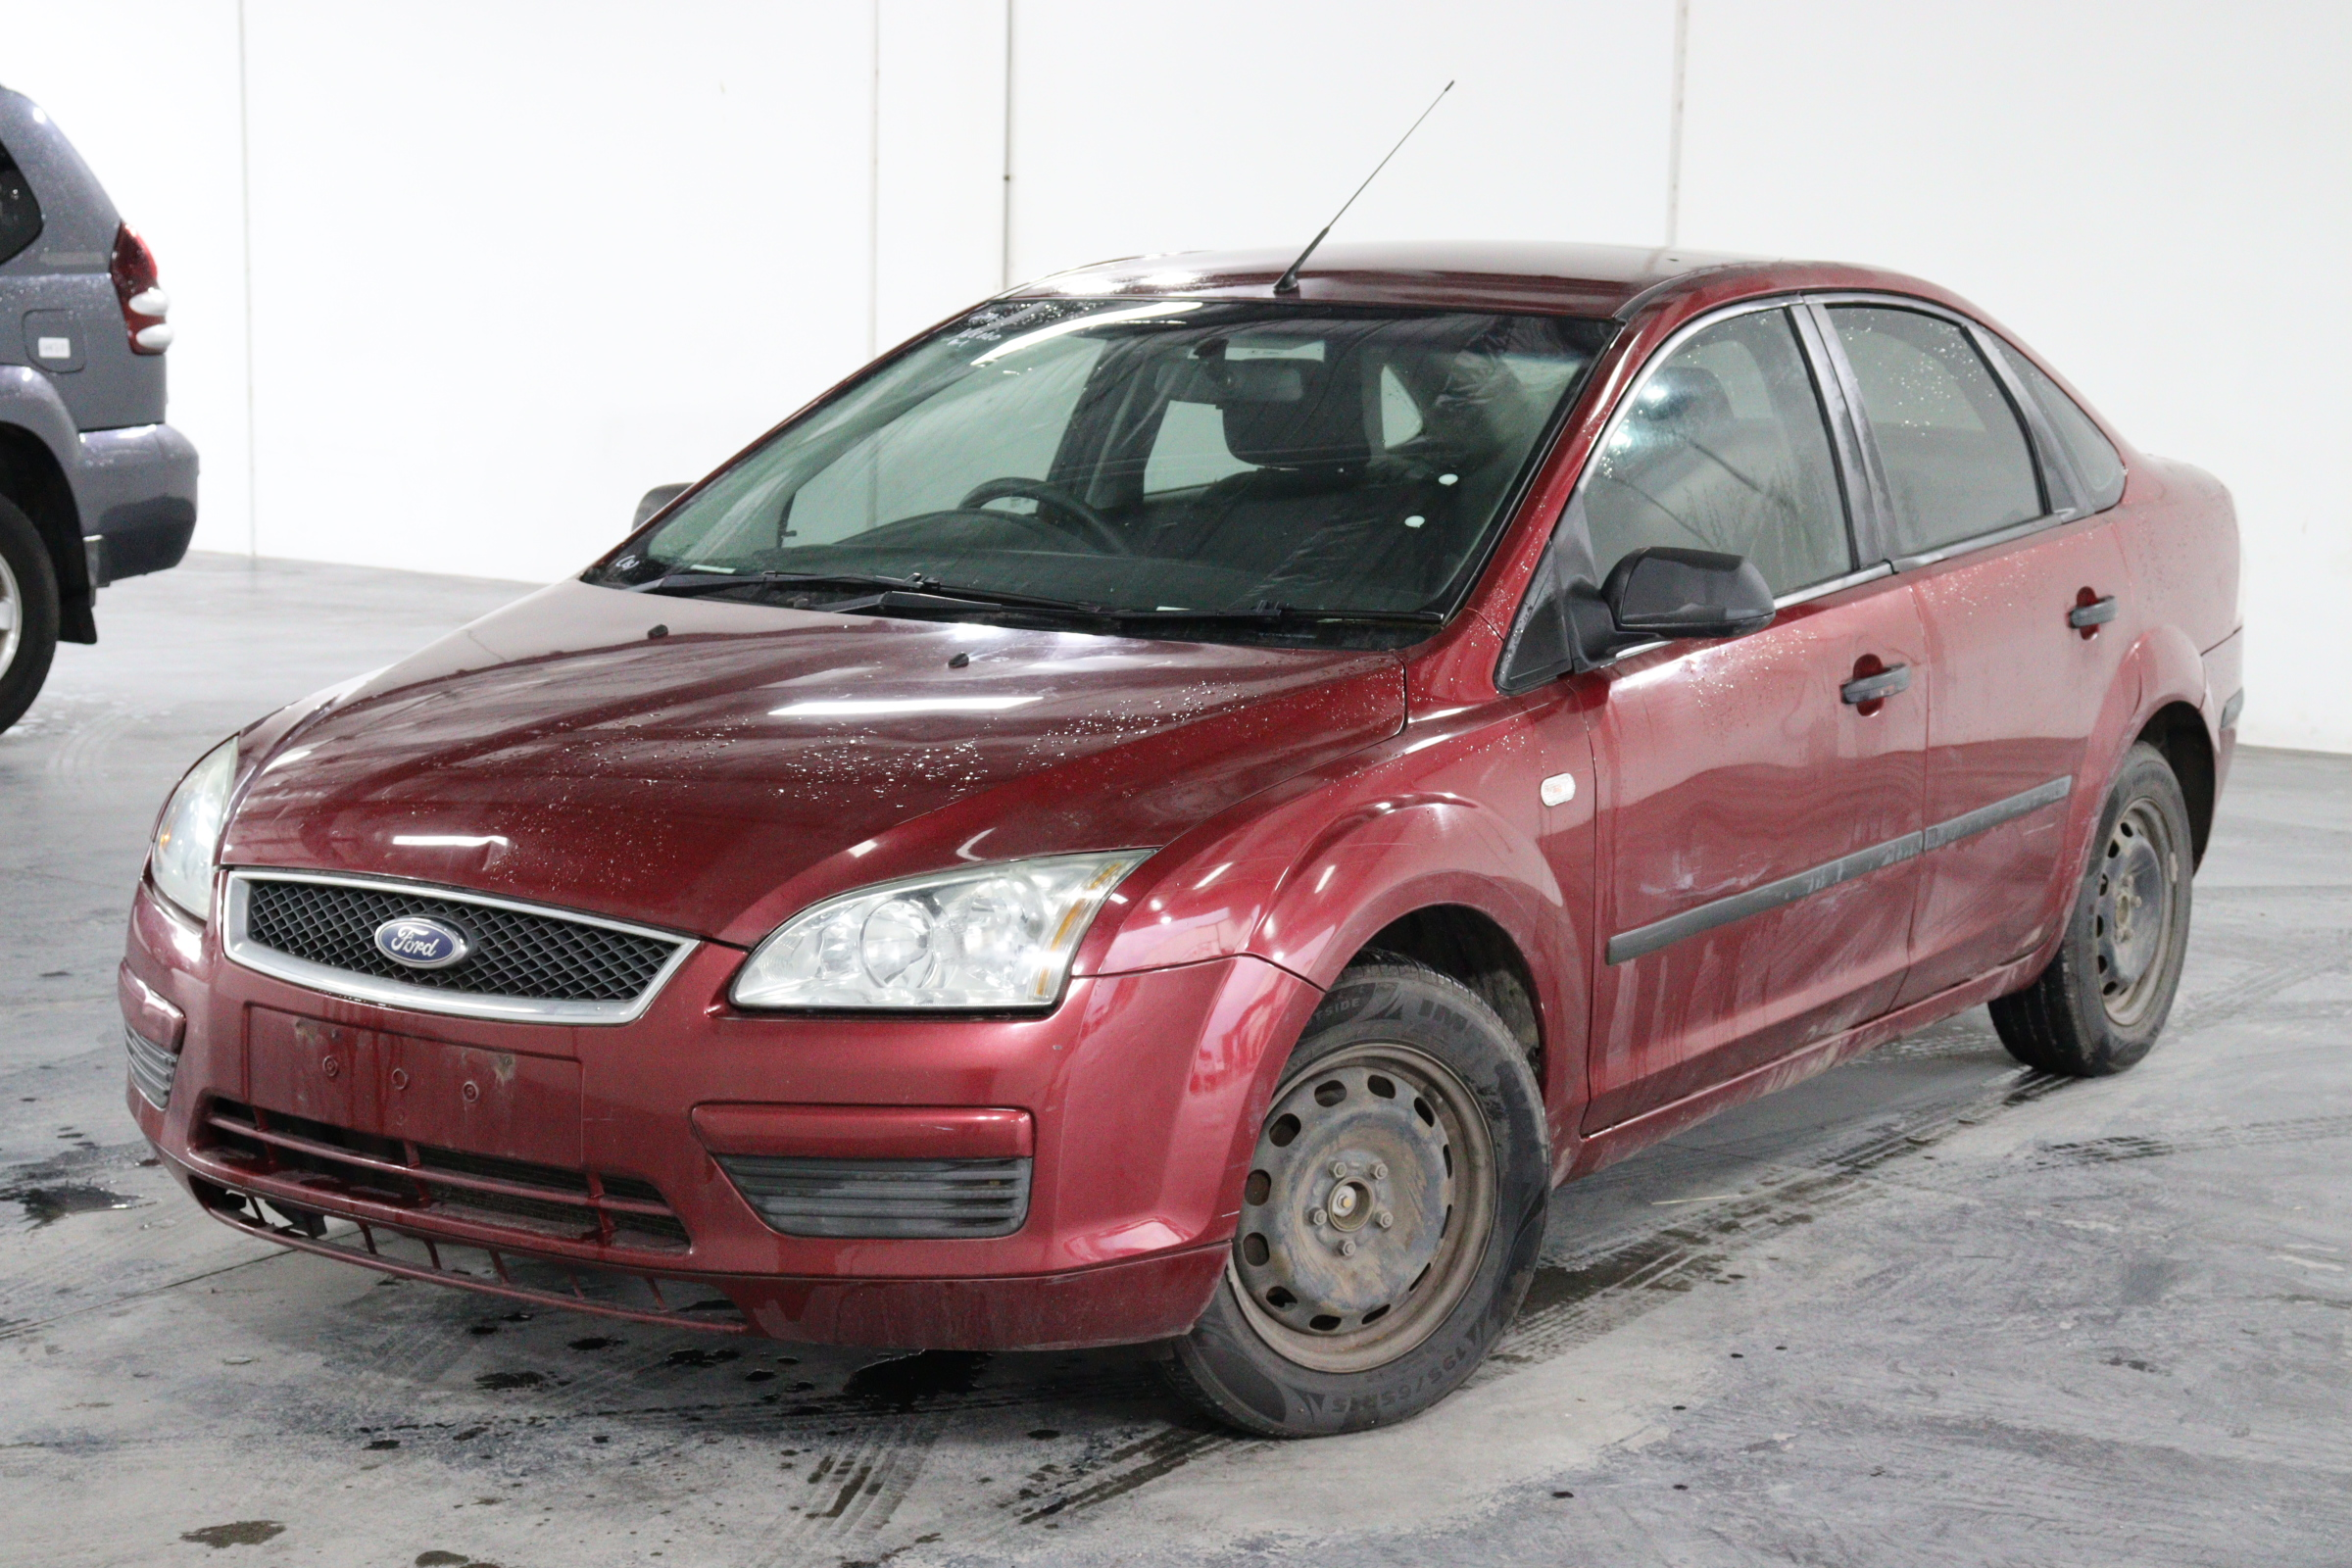 2007 Ford Focus CL LS Automatic Sedan